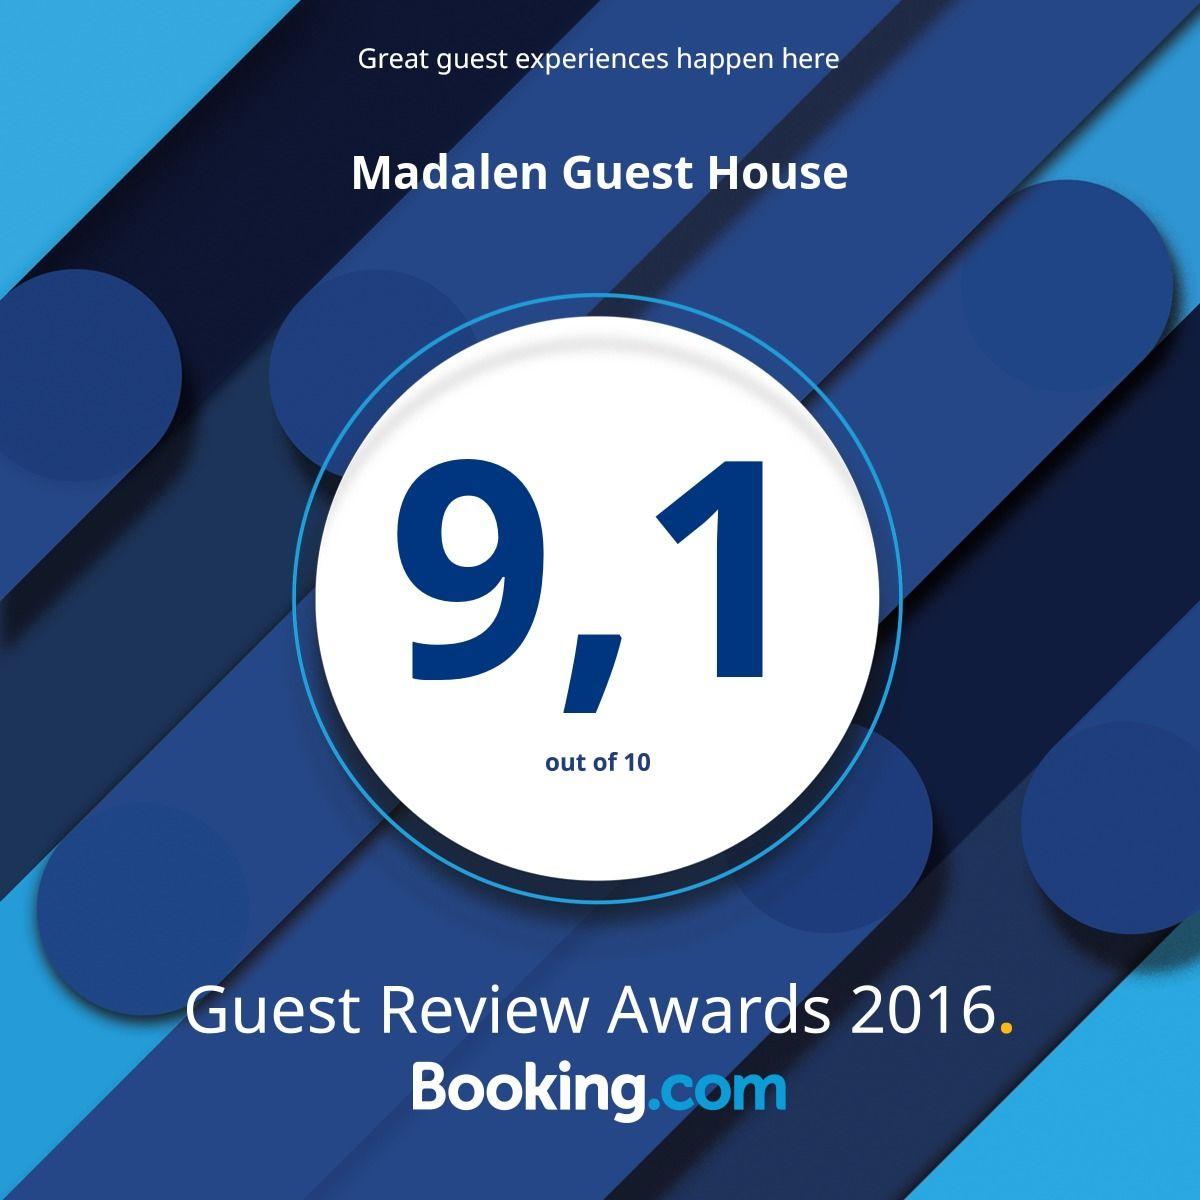 Madalen Guest House